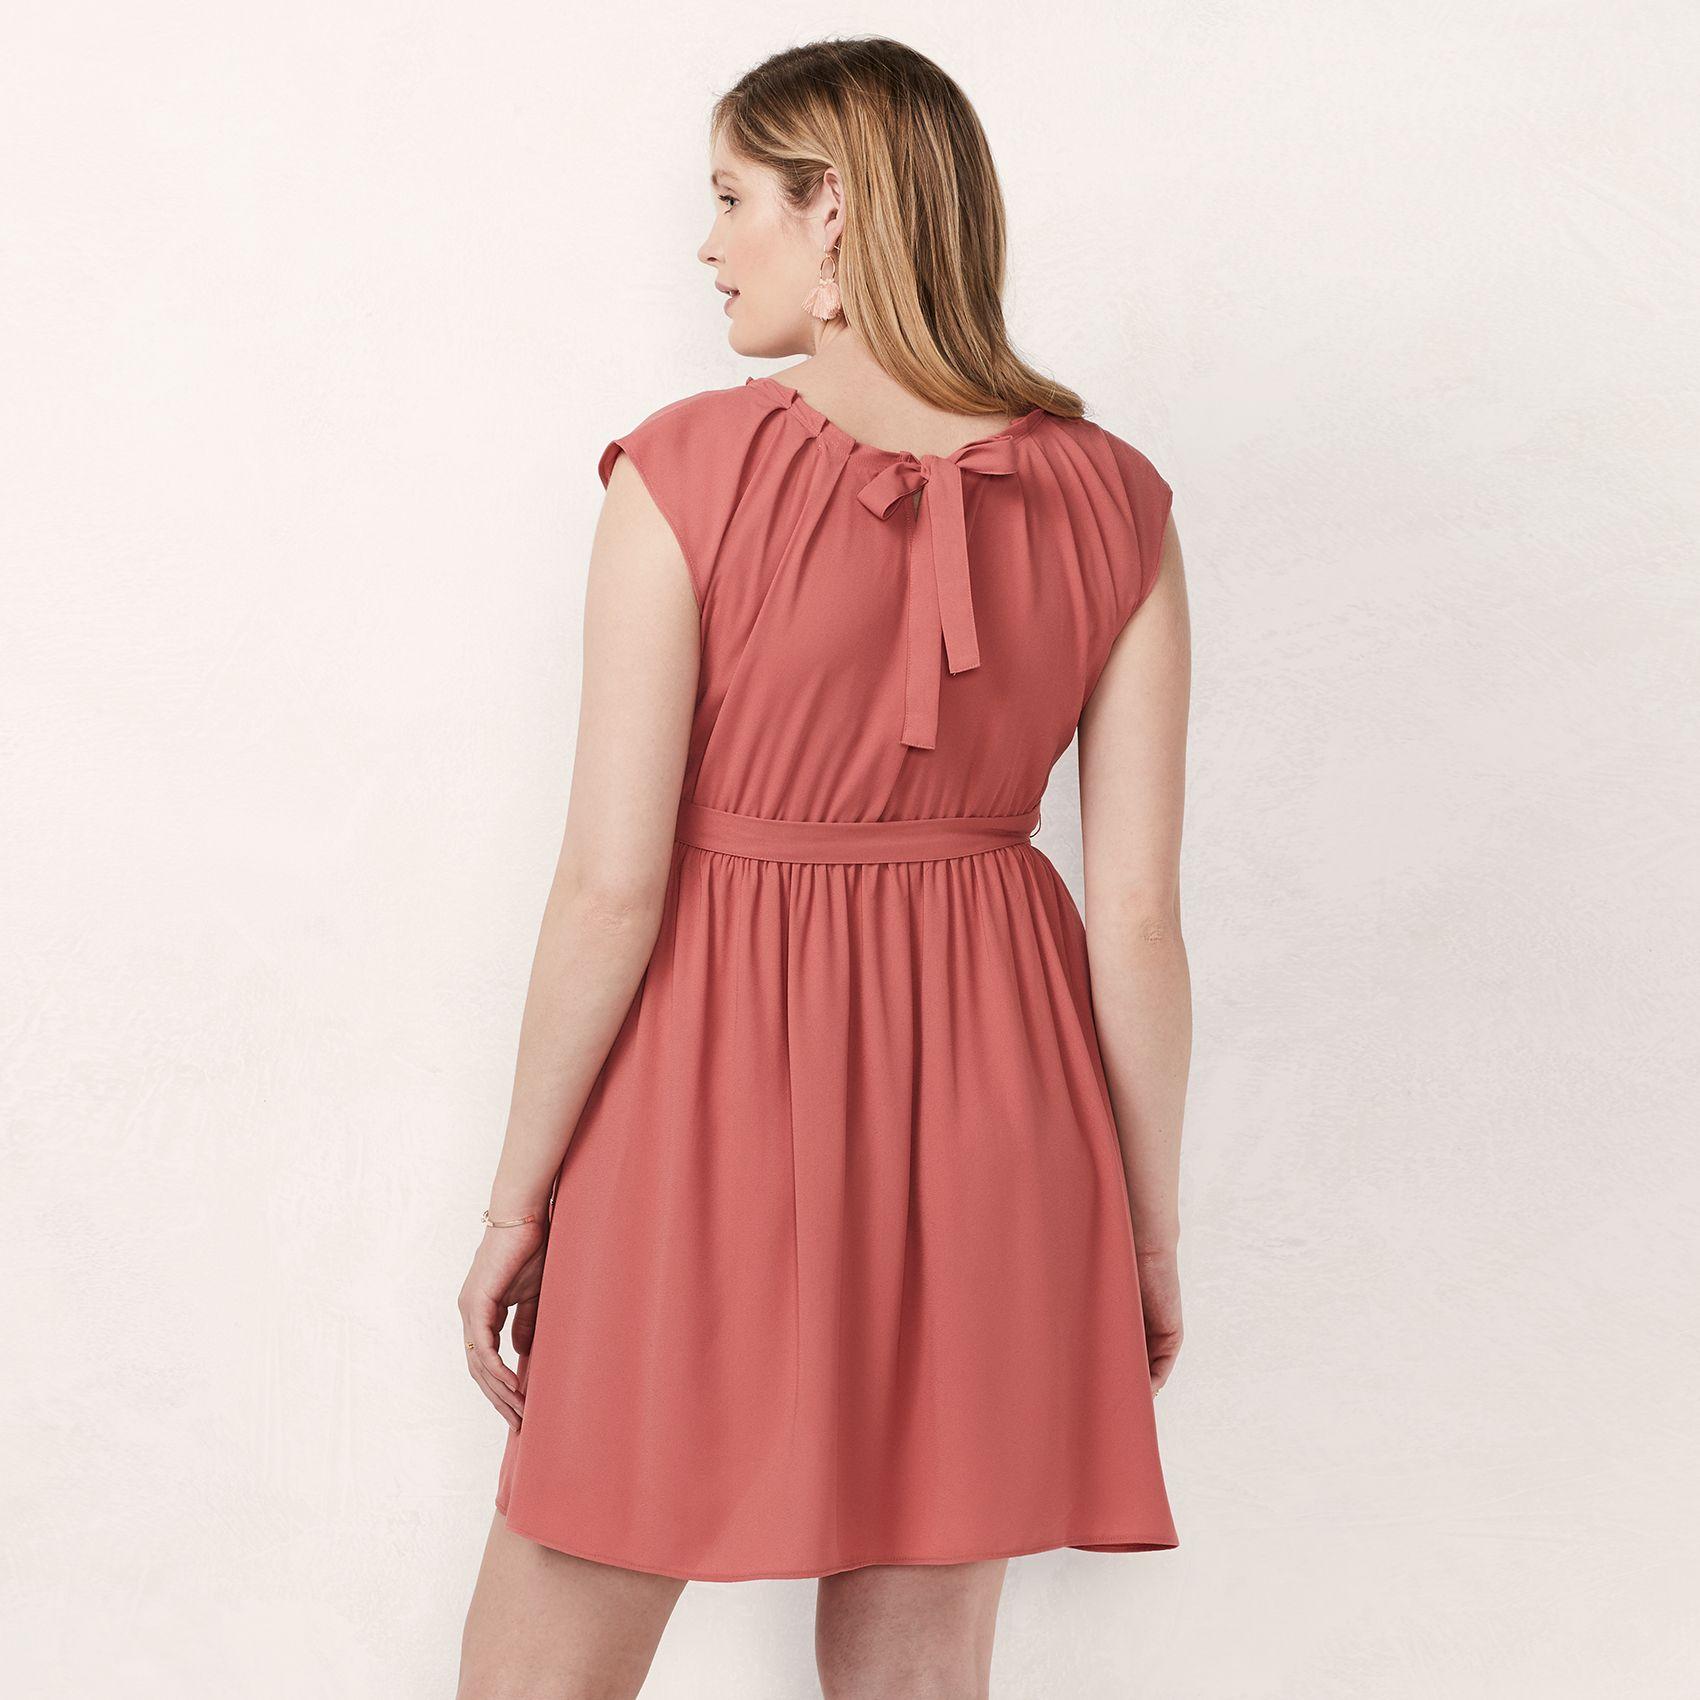 Womens lc lauren conrad maternity clothing kohls ombrellifo Choice Image